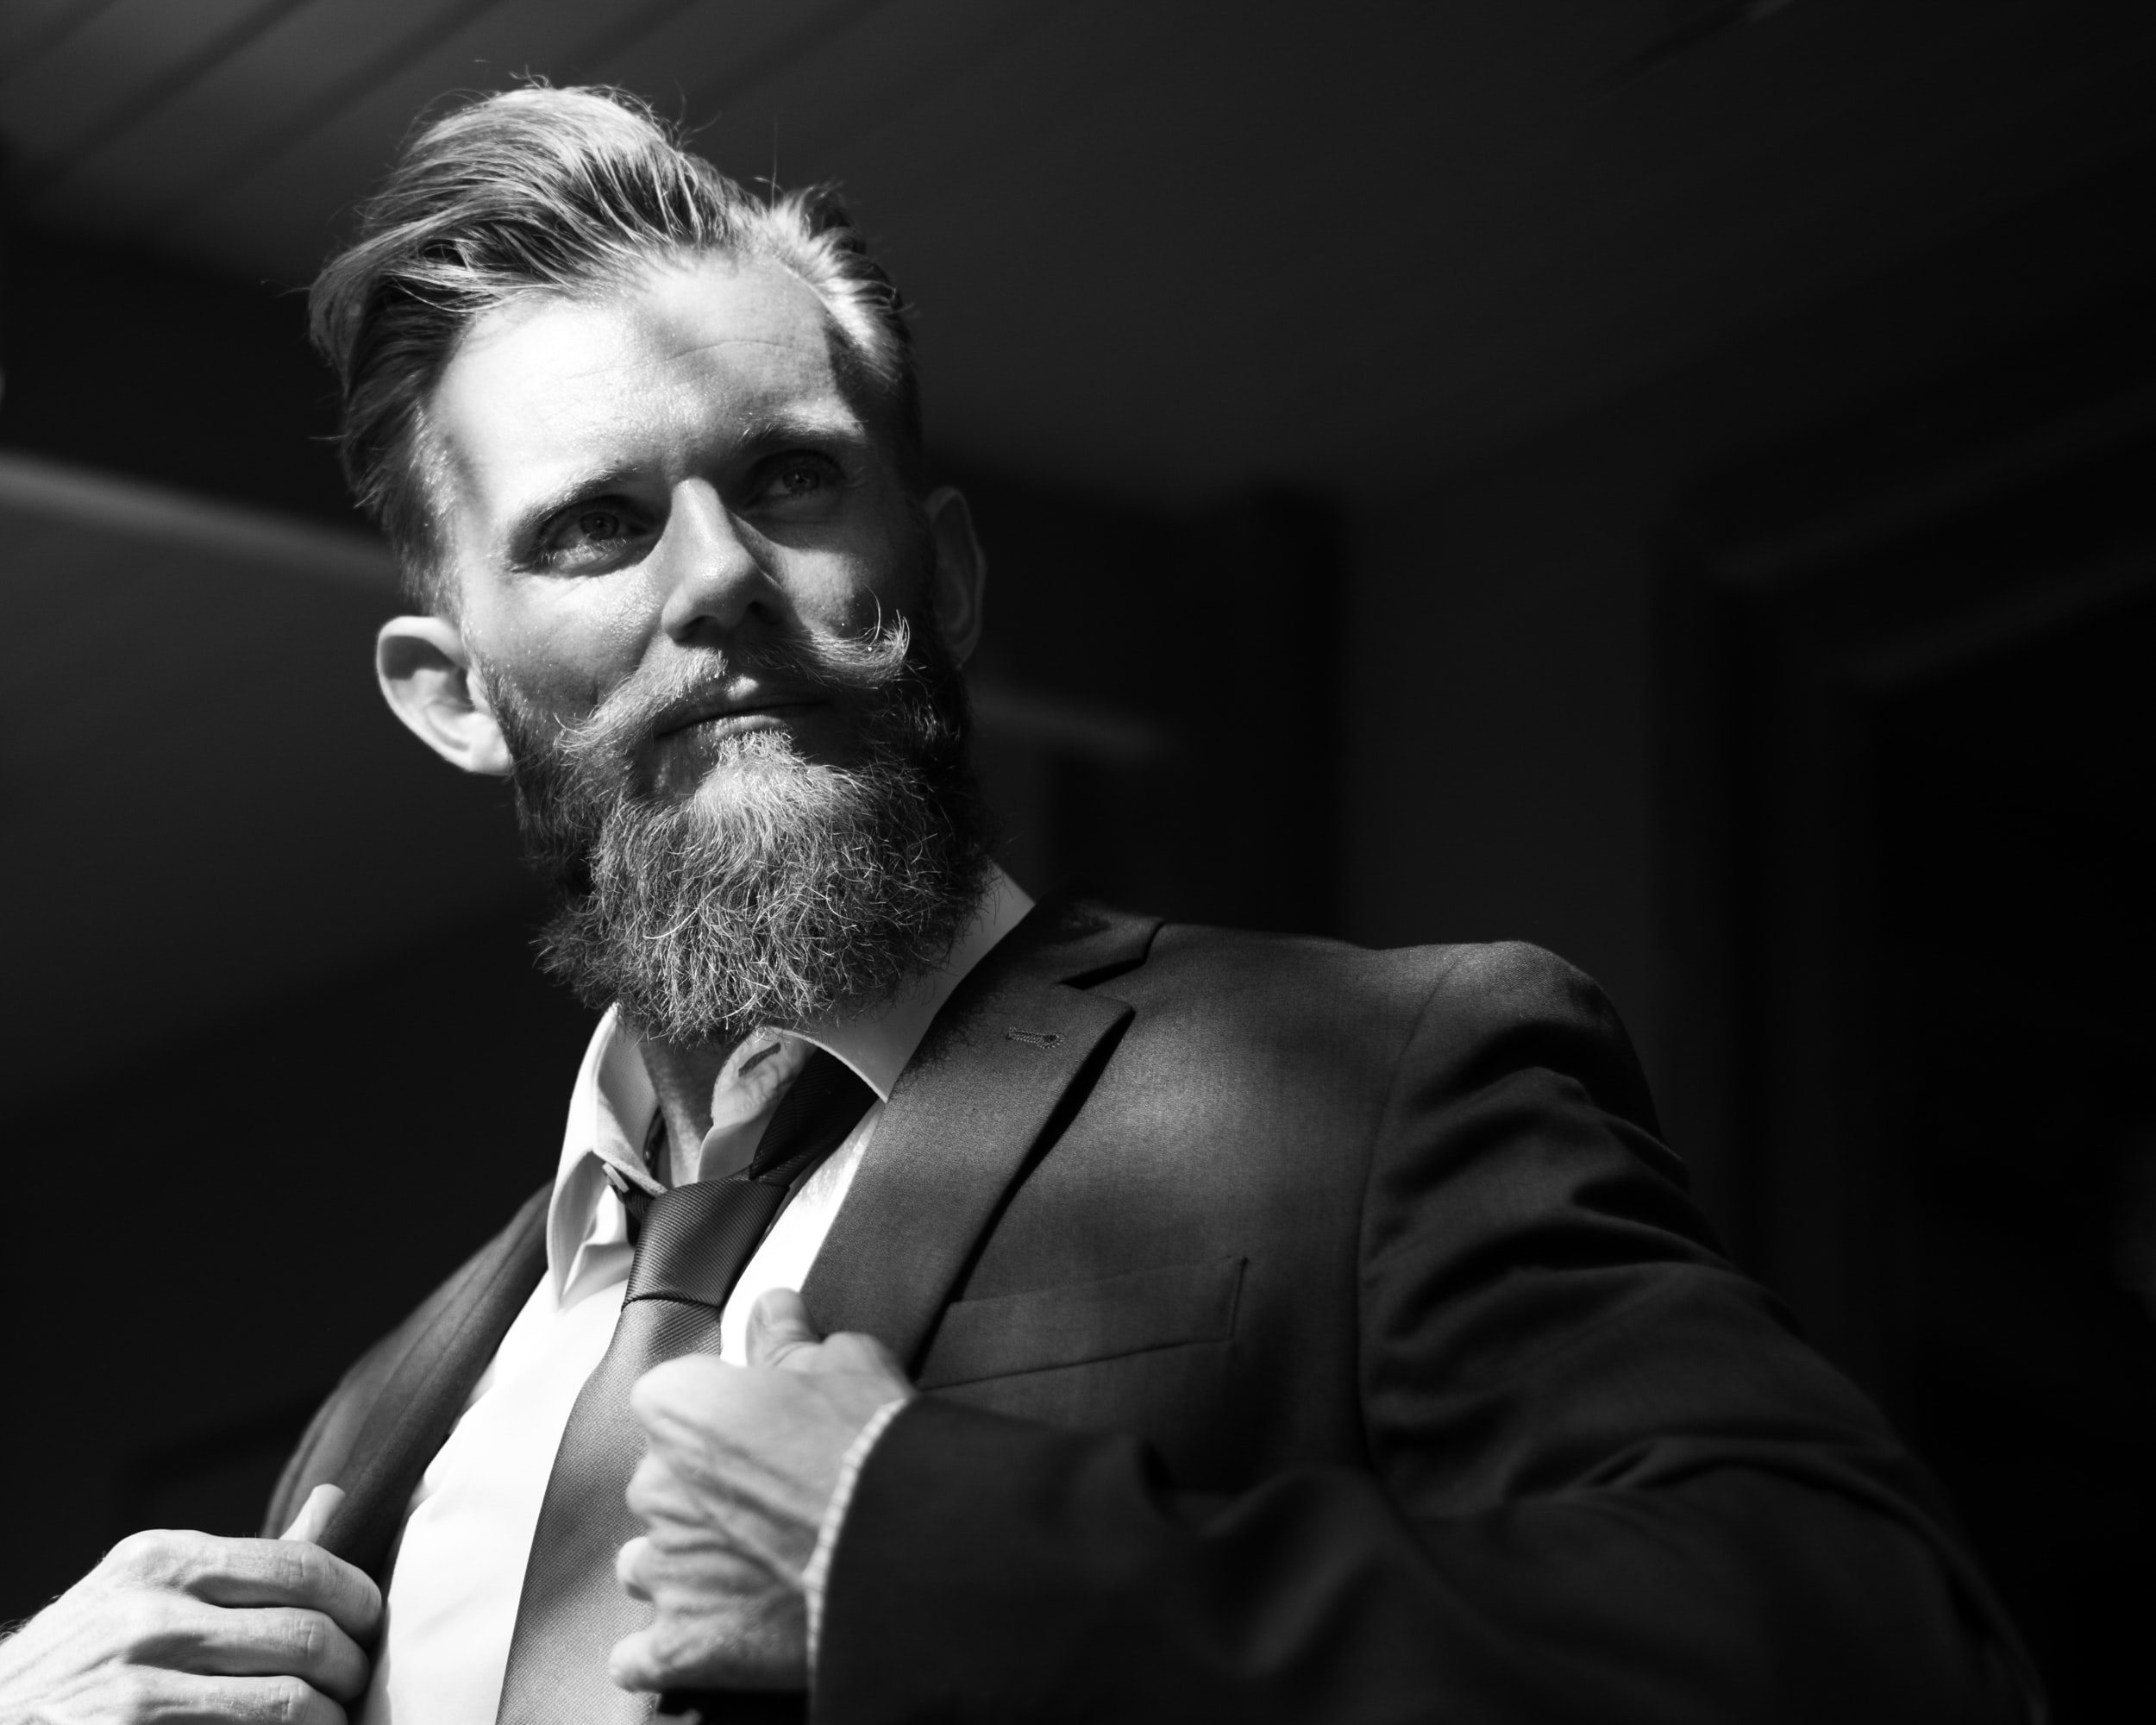 greyscale photo of man wearing notched lapel suit jacket